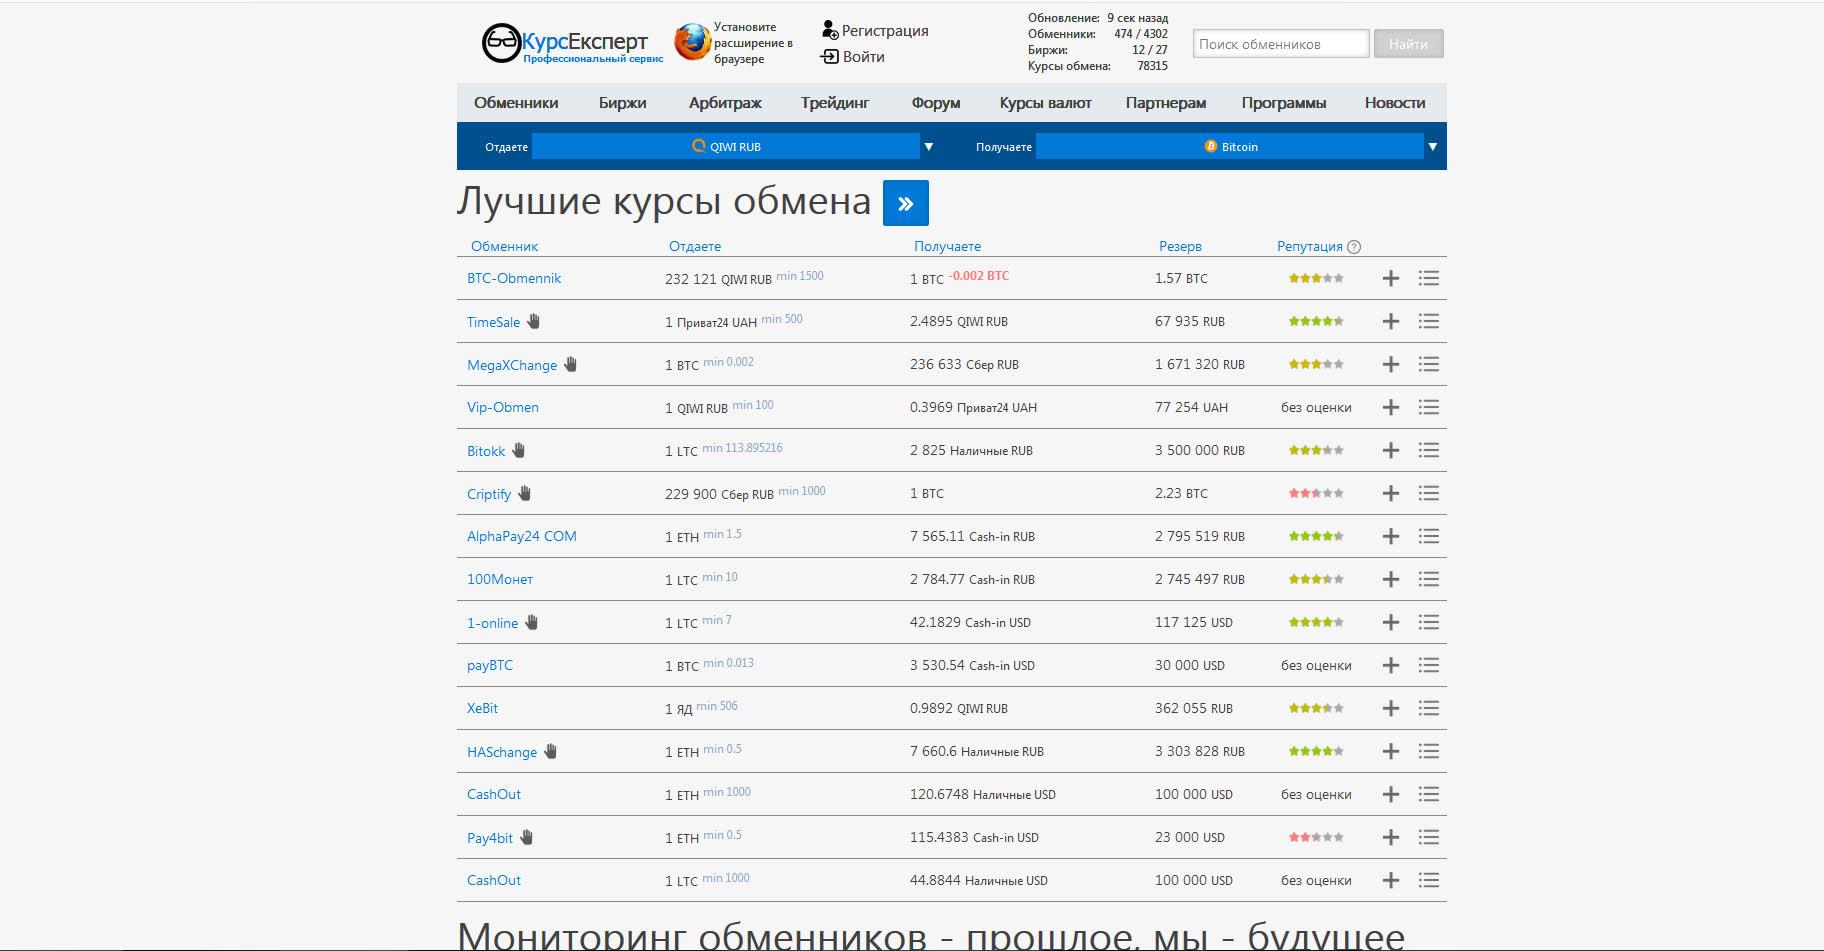 Kurs.expert - сераис по мониторингу валют